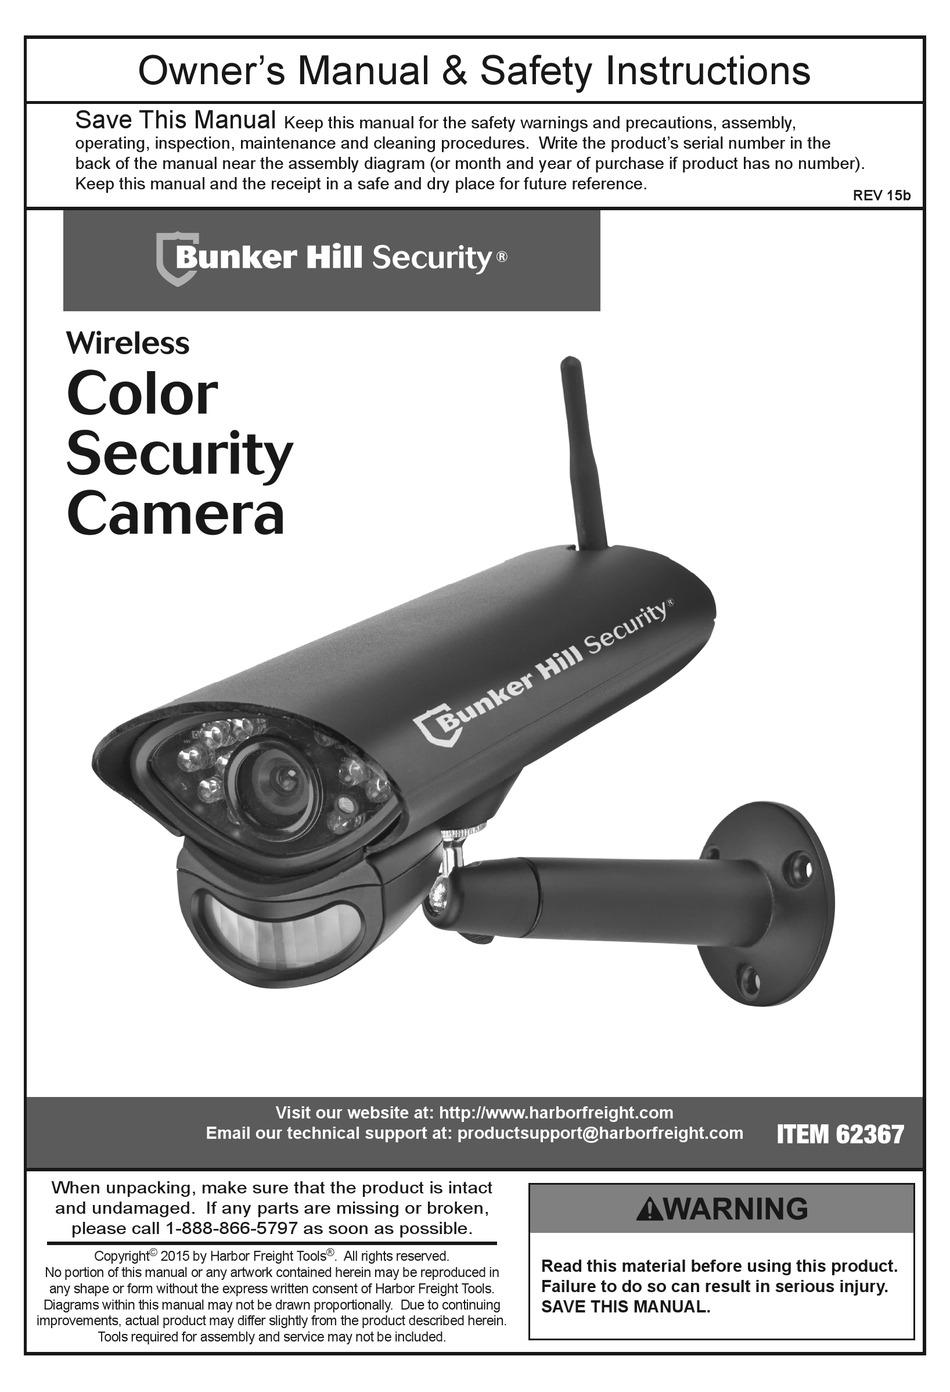 Bunker Hill Security Mobile Setup : bunker, security, mobile, setup, BUNKER, SECURITY, 62367, OWNER'S, MANUAL, Download, ManualsLib